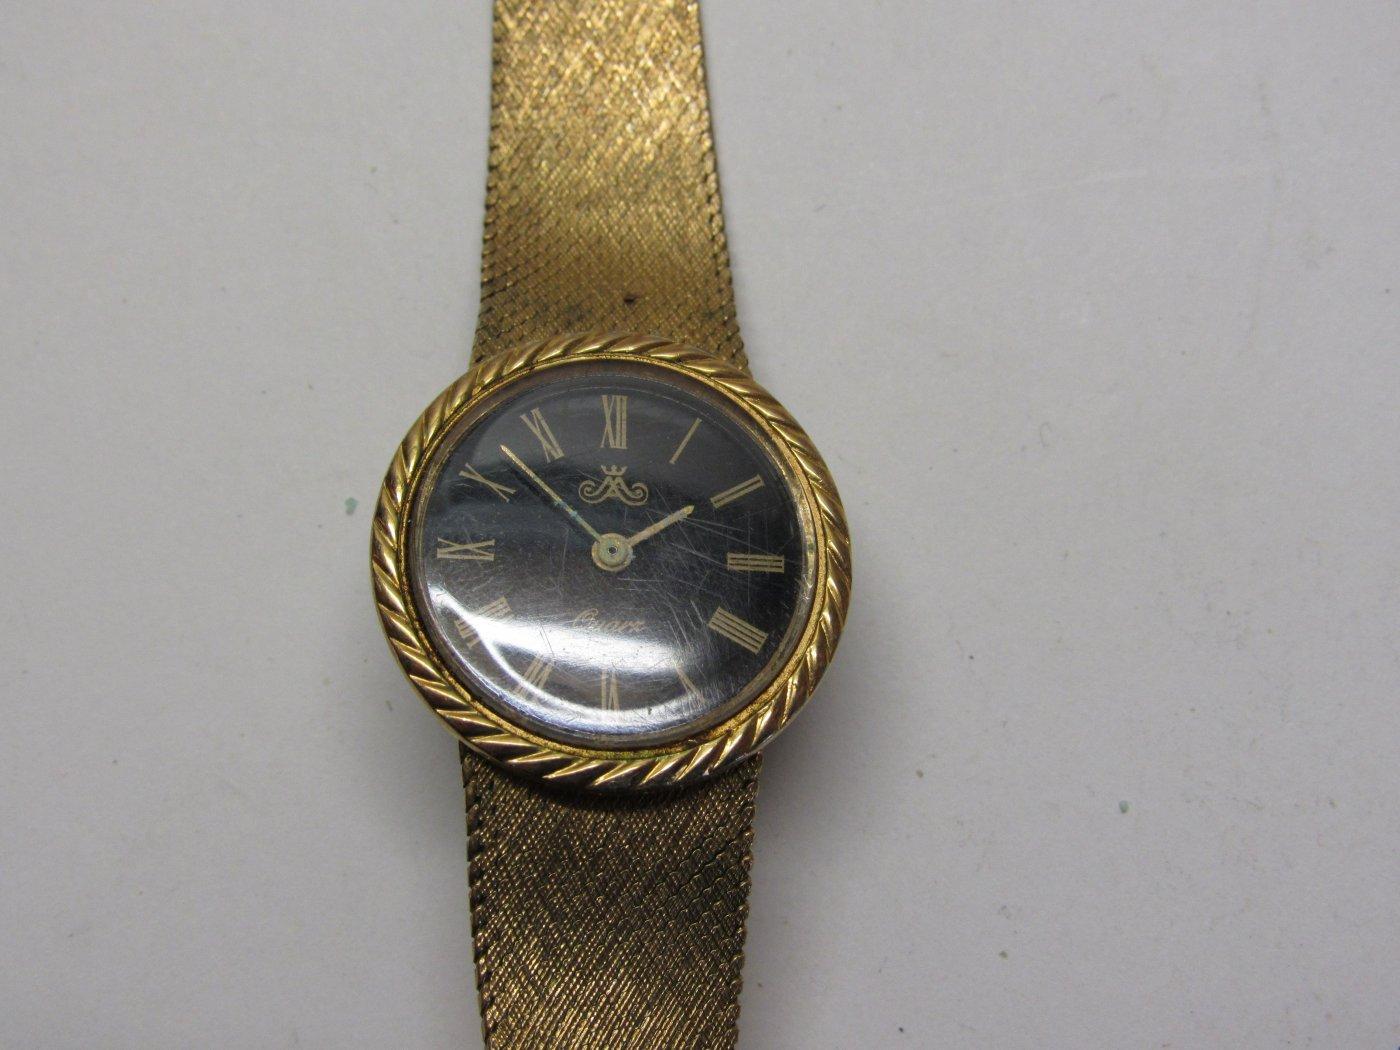 konvolut an uhren armbanduhren htu damenuhren ebay. Black Bedroom Furniture Sets. Home Design Ideas